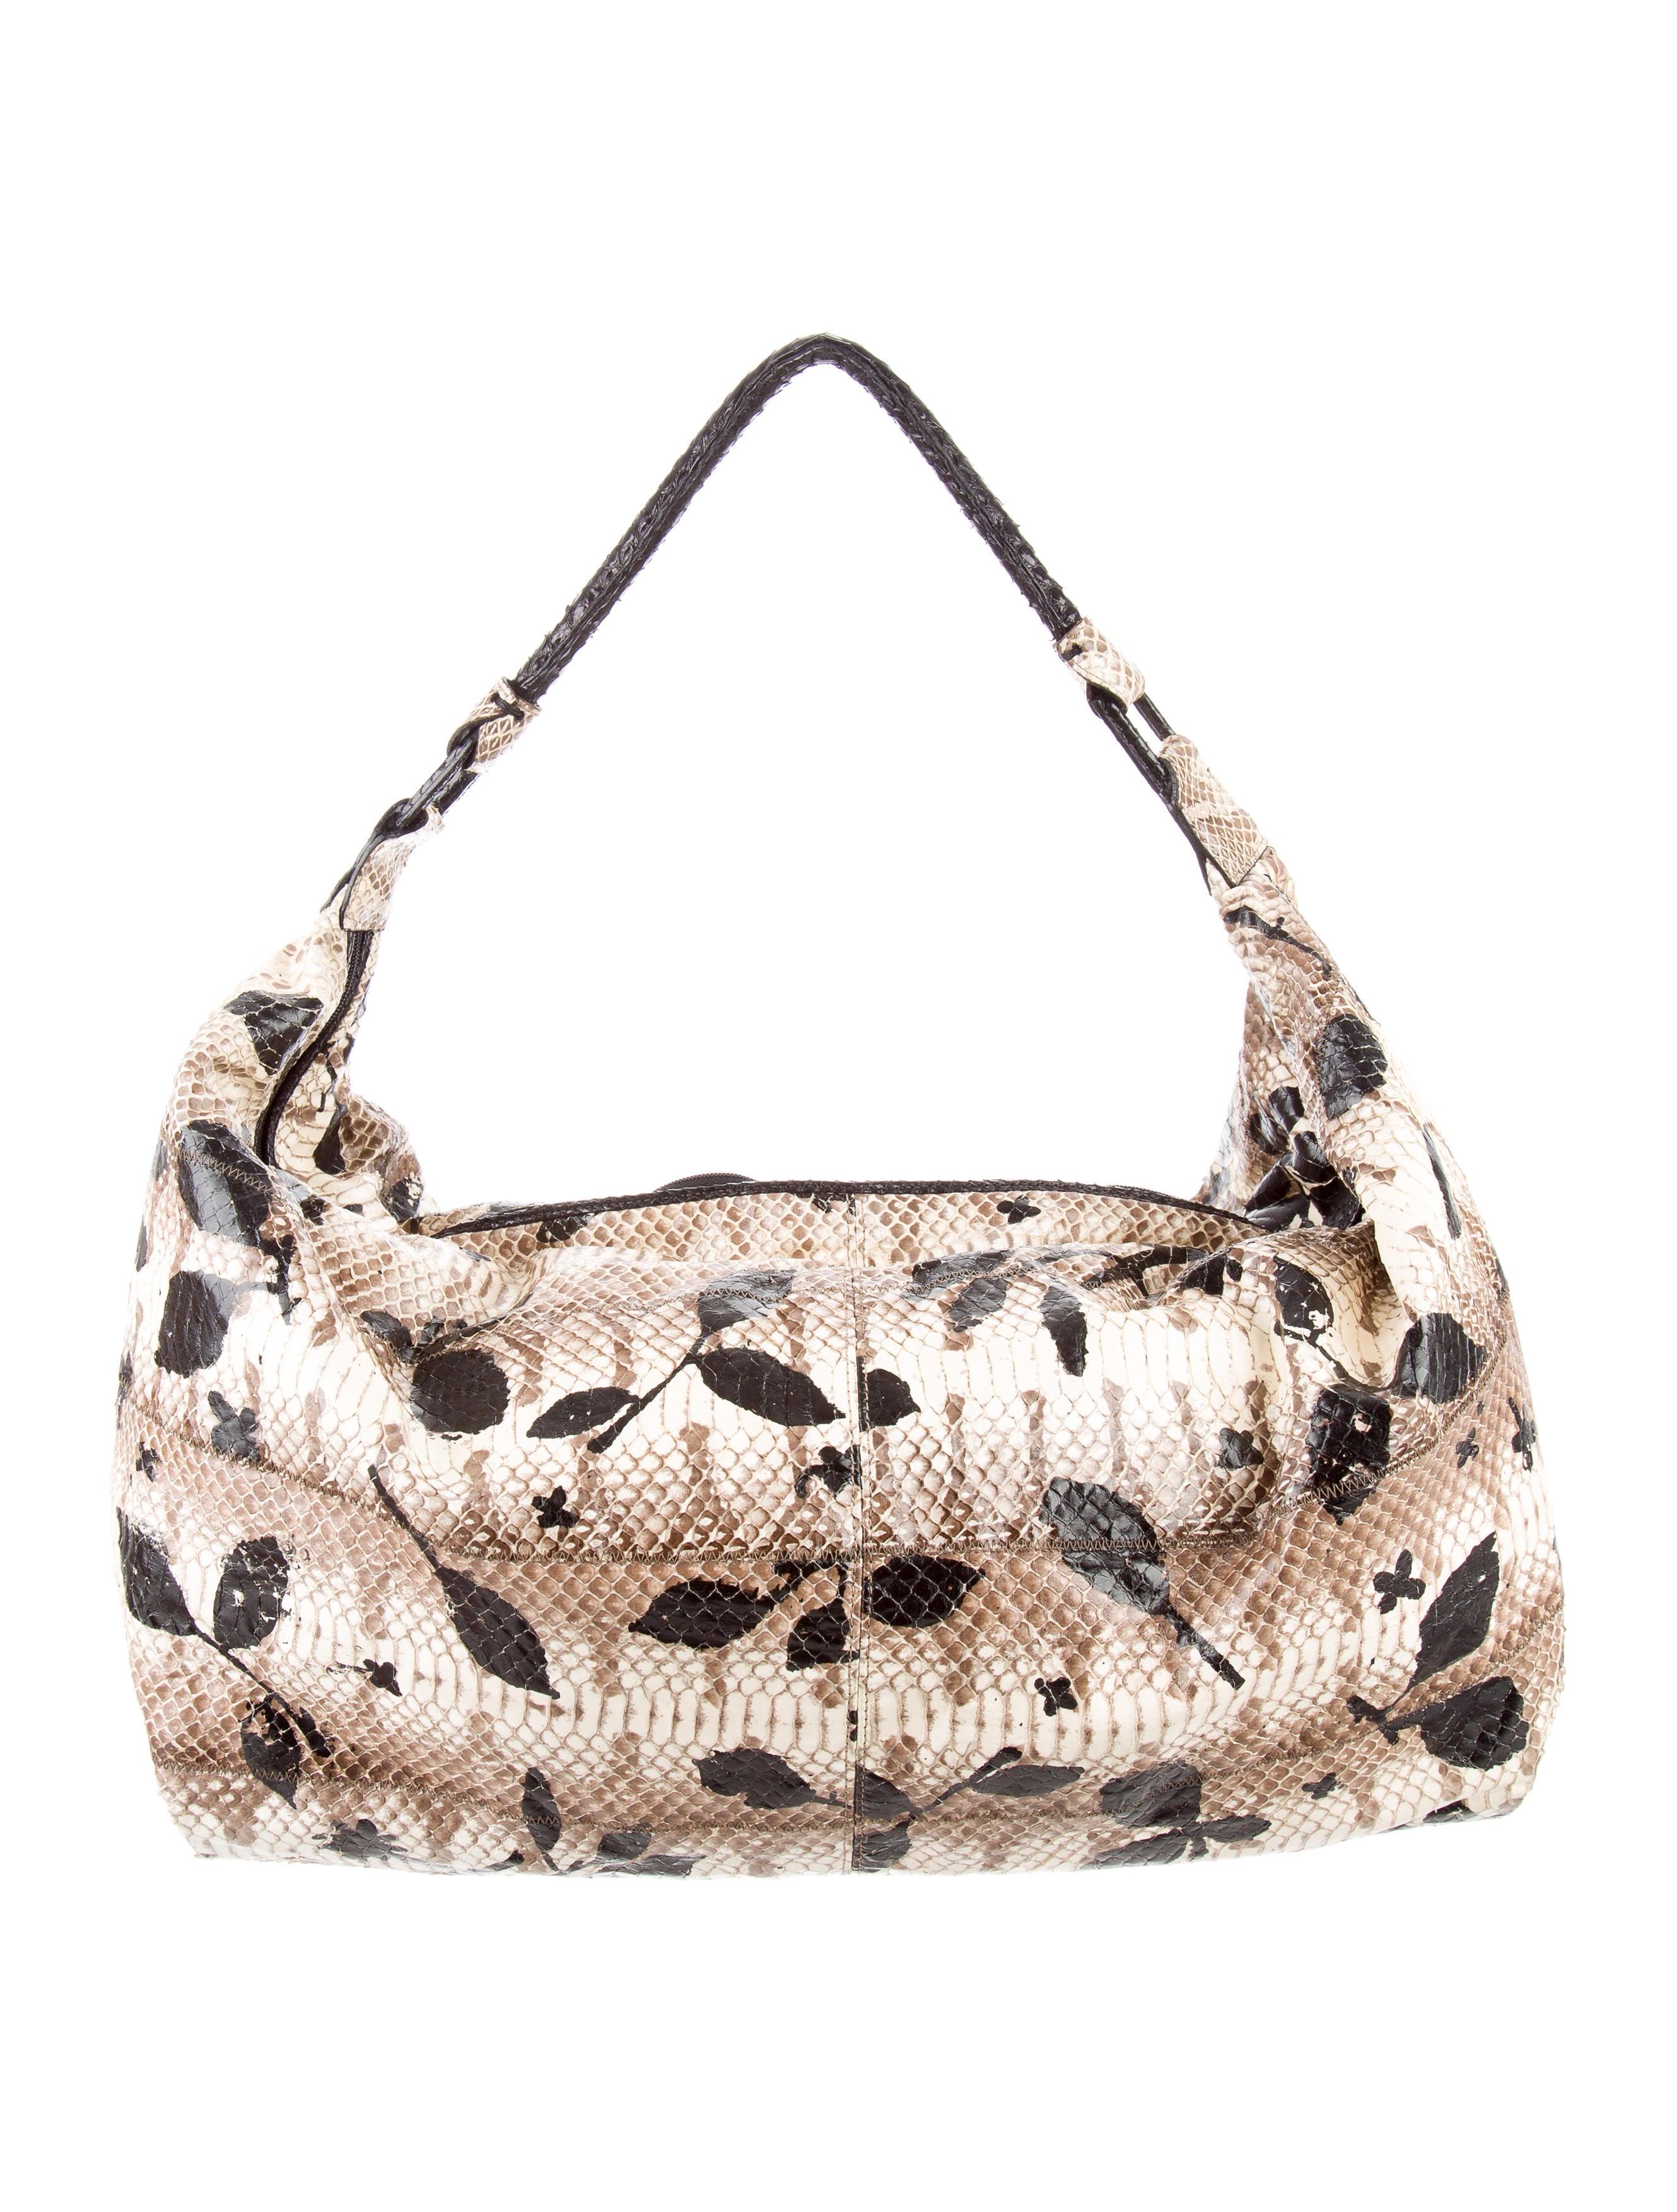 Carlos Falchi Snakeskin Hobo Bag - Handbags - CAF21468 | The RealReal